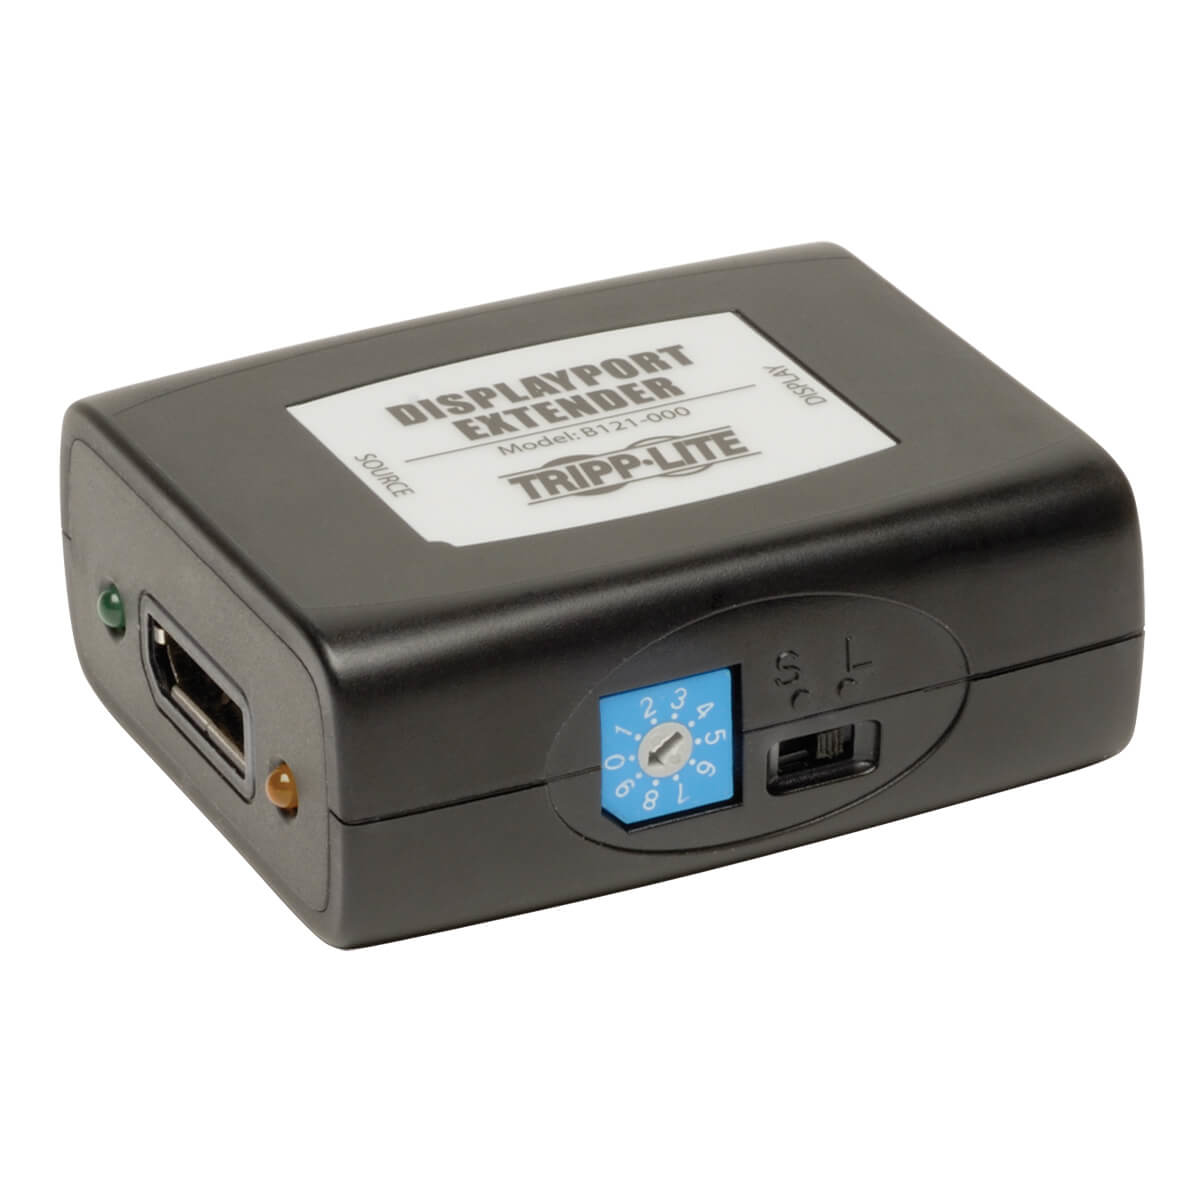 DisplayPort Extender Equalizer Repeater for Video & Audio 1920x1200 at 60Hz/1080p (Displayport F/F)